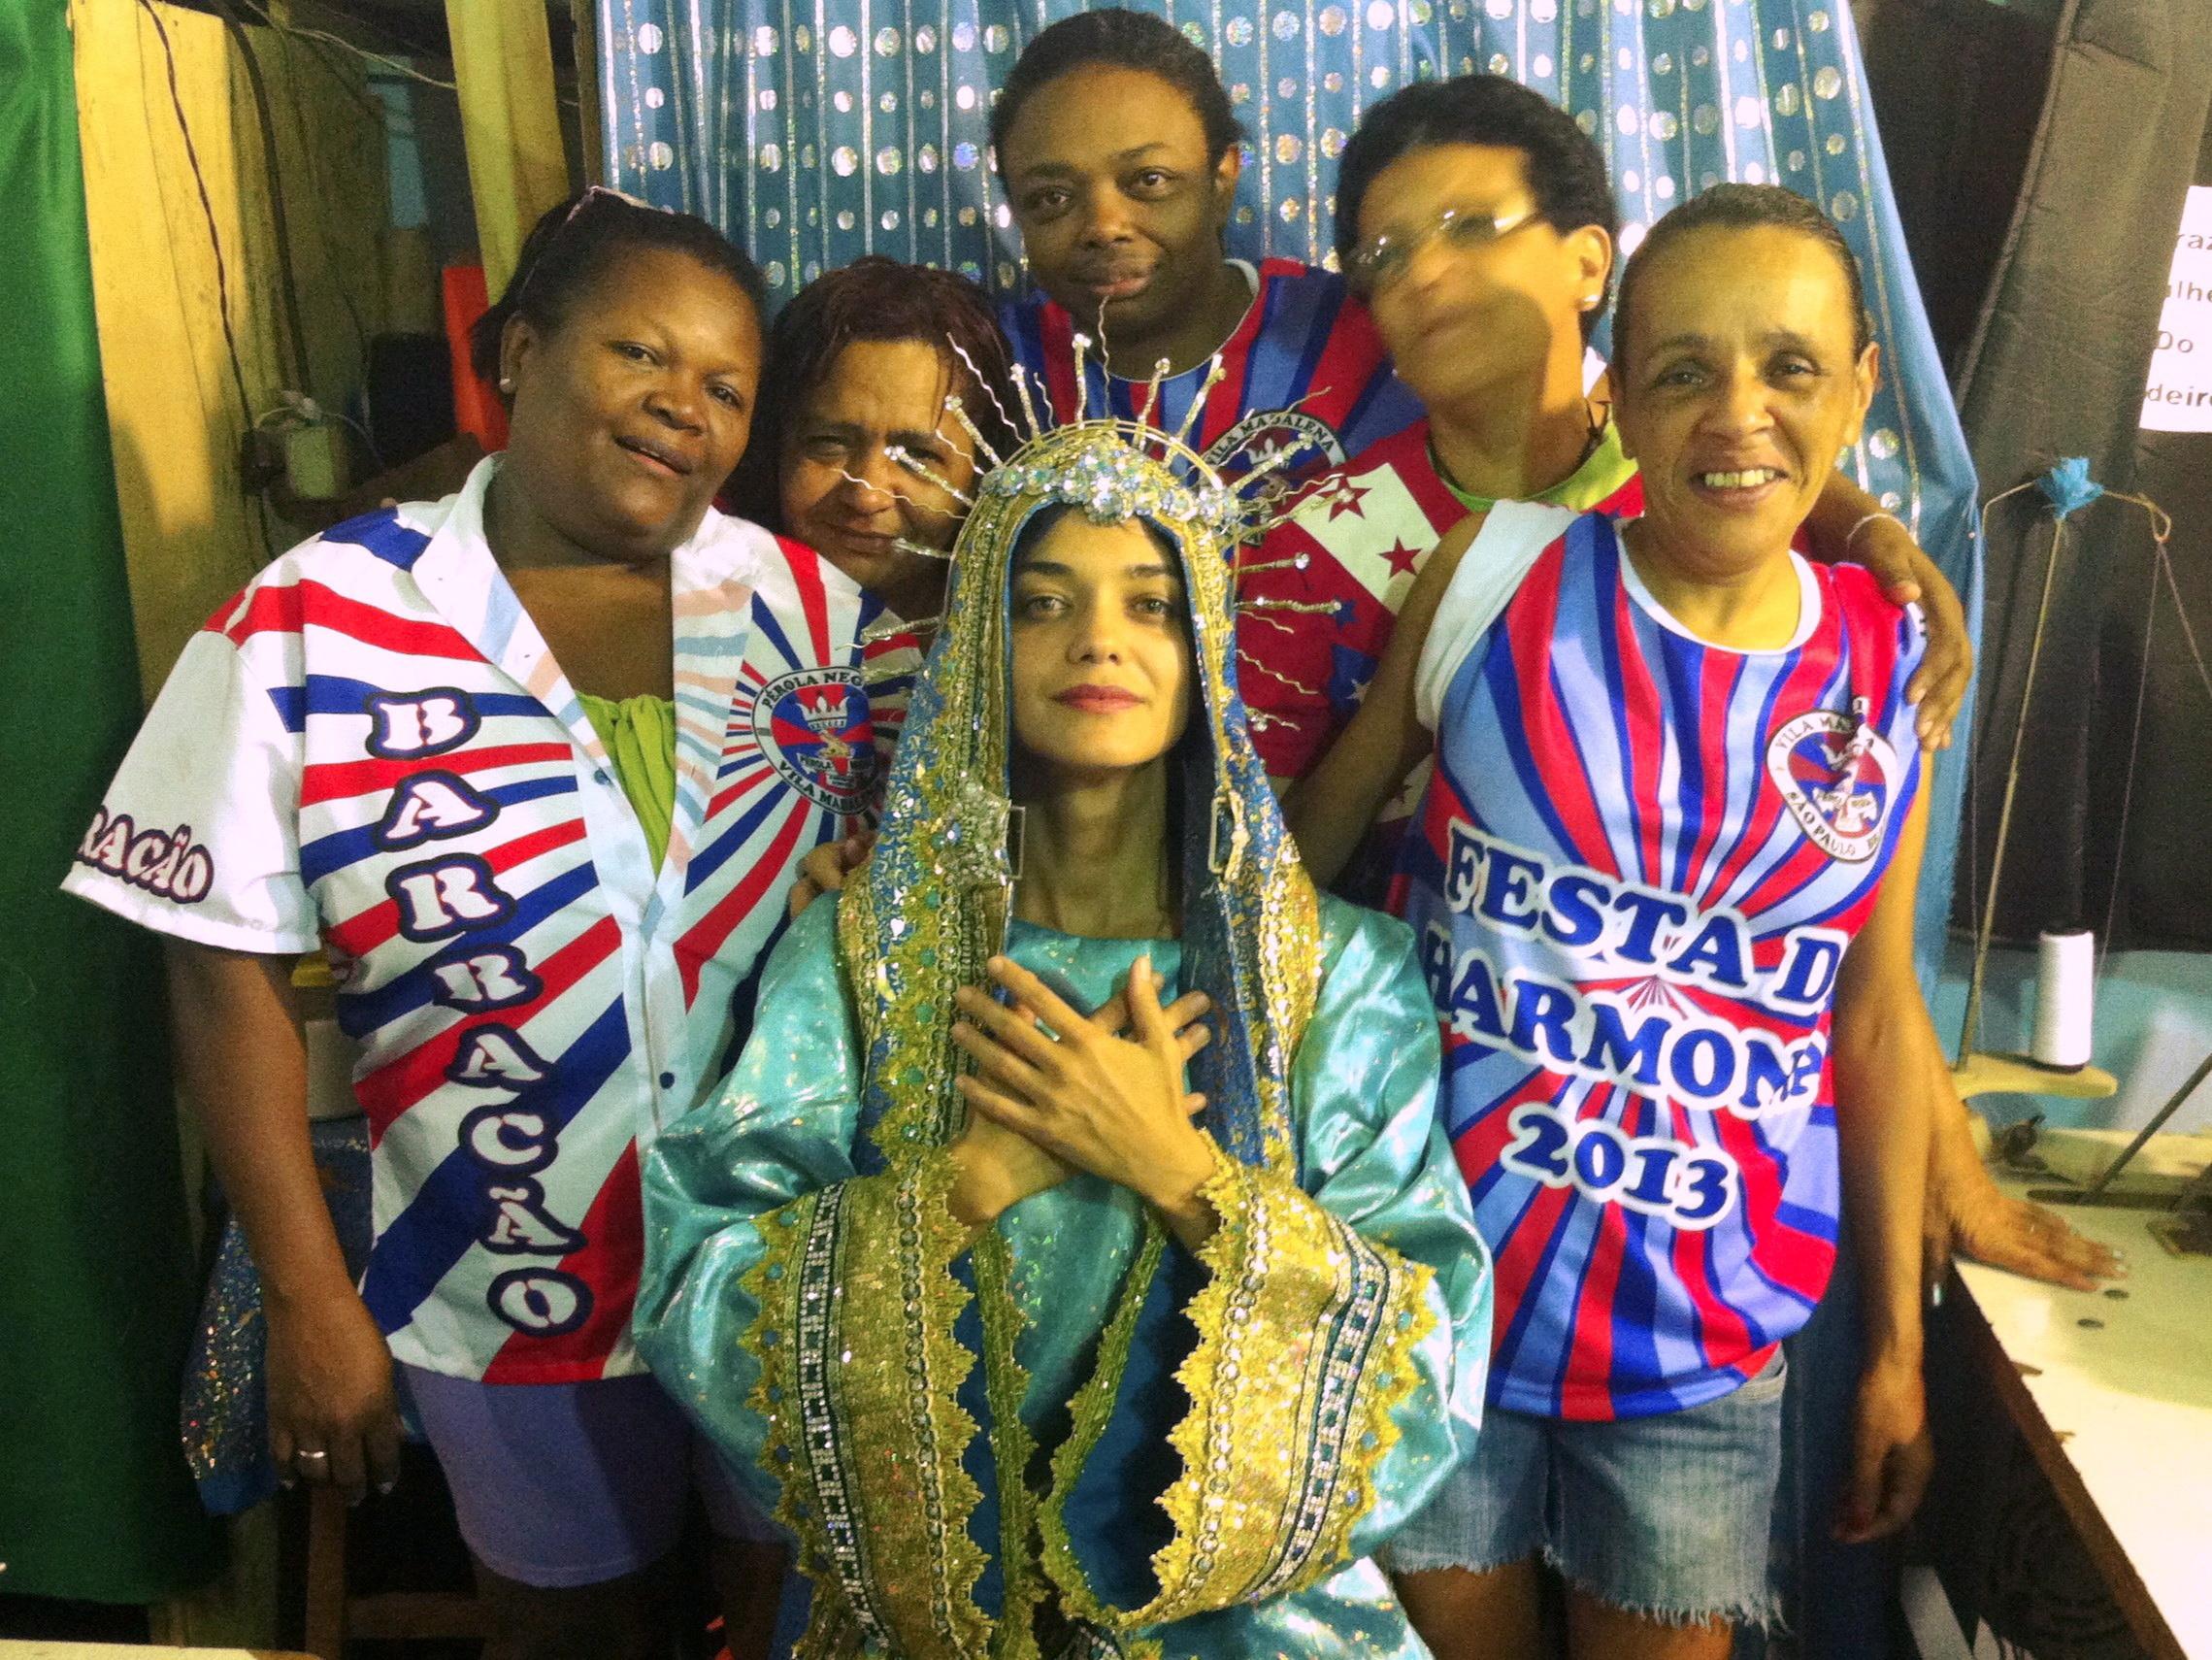 Ana Cecília Costa Atriz prestes a voltar à tv em 'a teia', ana cecília costa faz